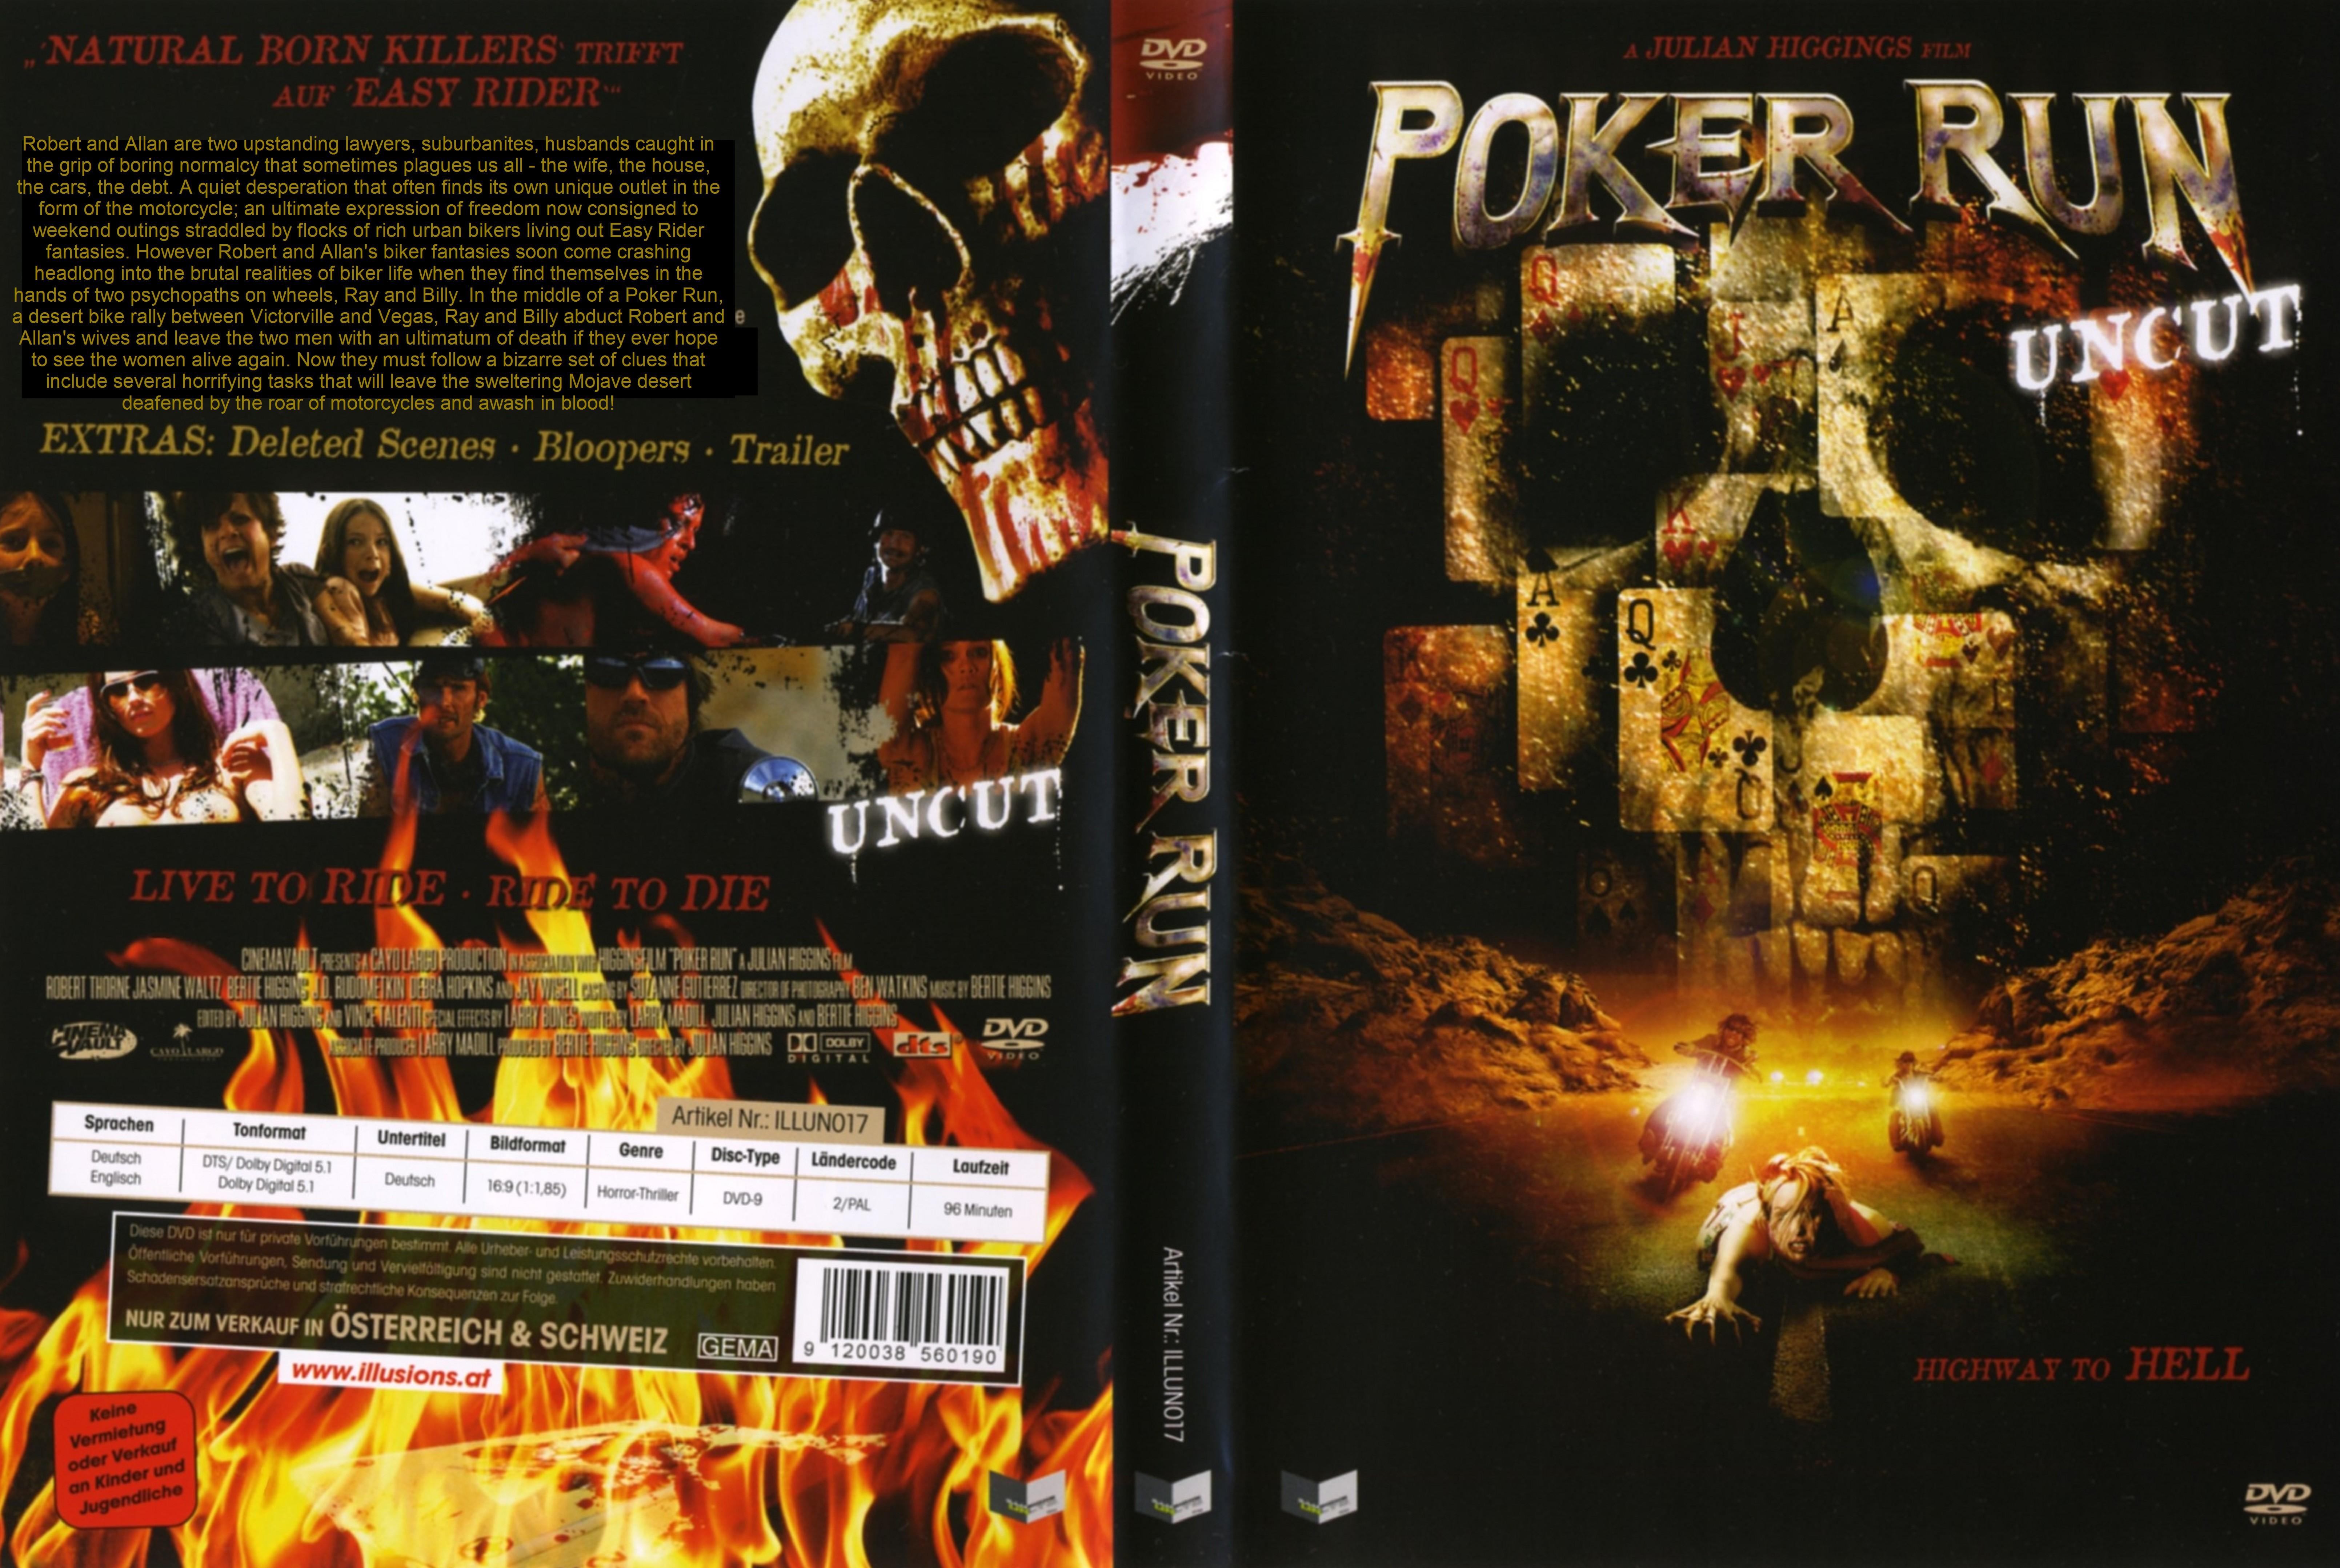 Poker run movie plot microgaming online casinos 2014